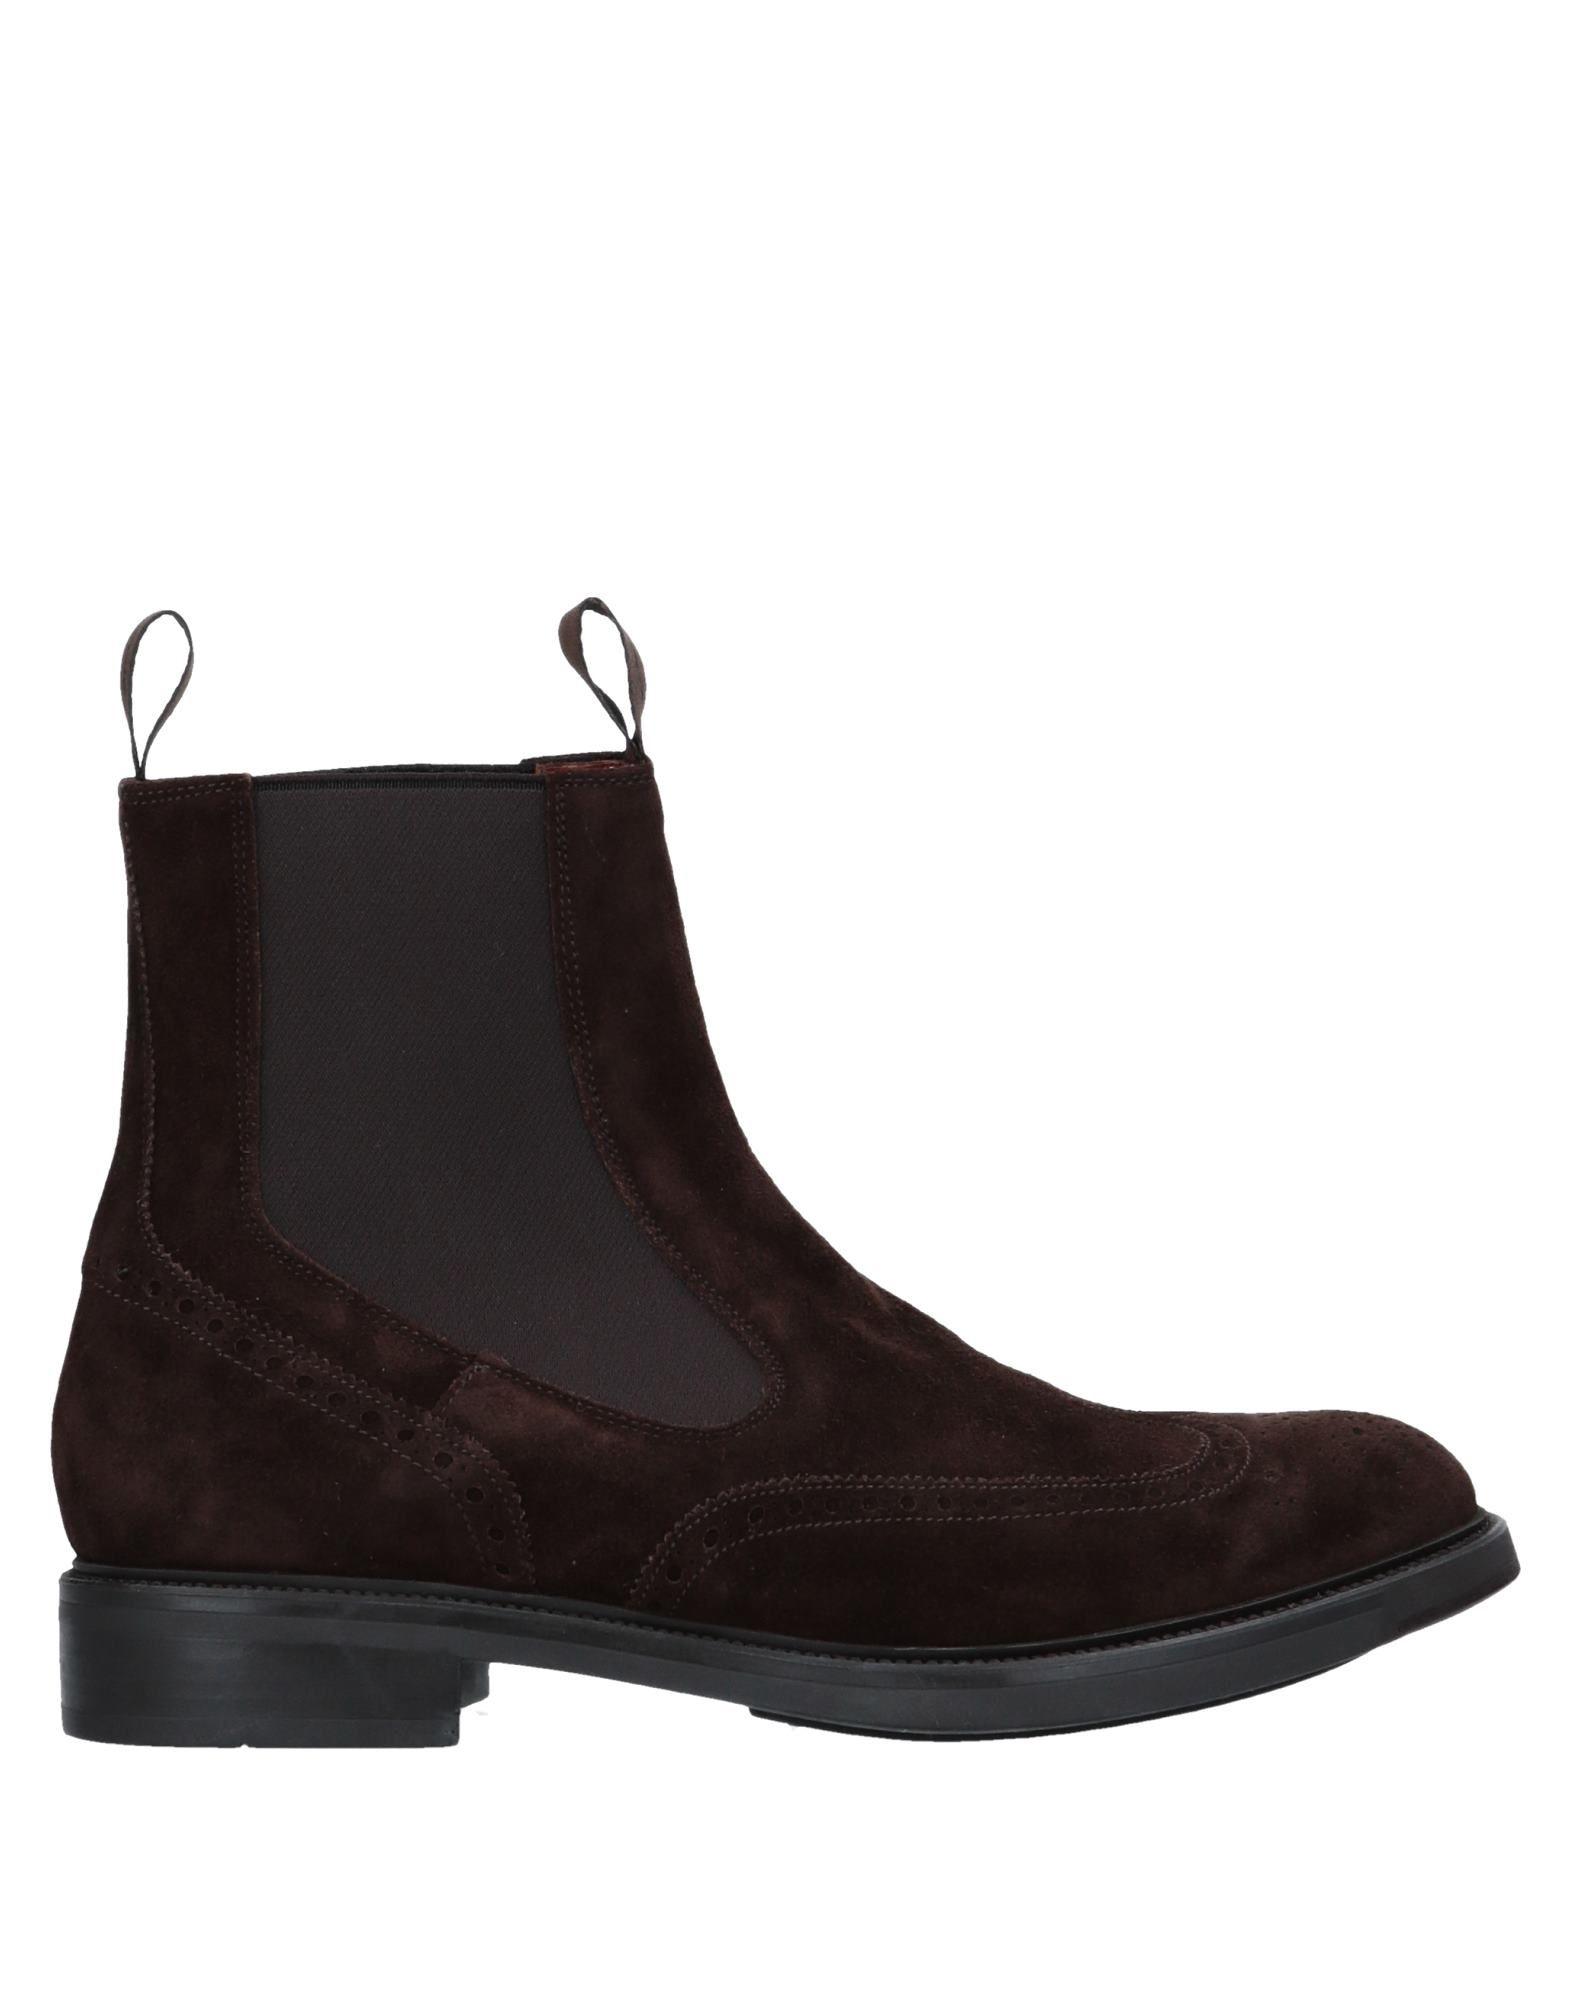 Damen Santoni Stiefelette Damen   11519410JL Heiße Schuhe 5510f0